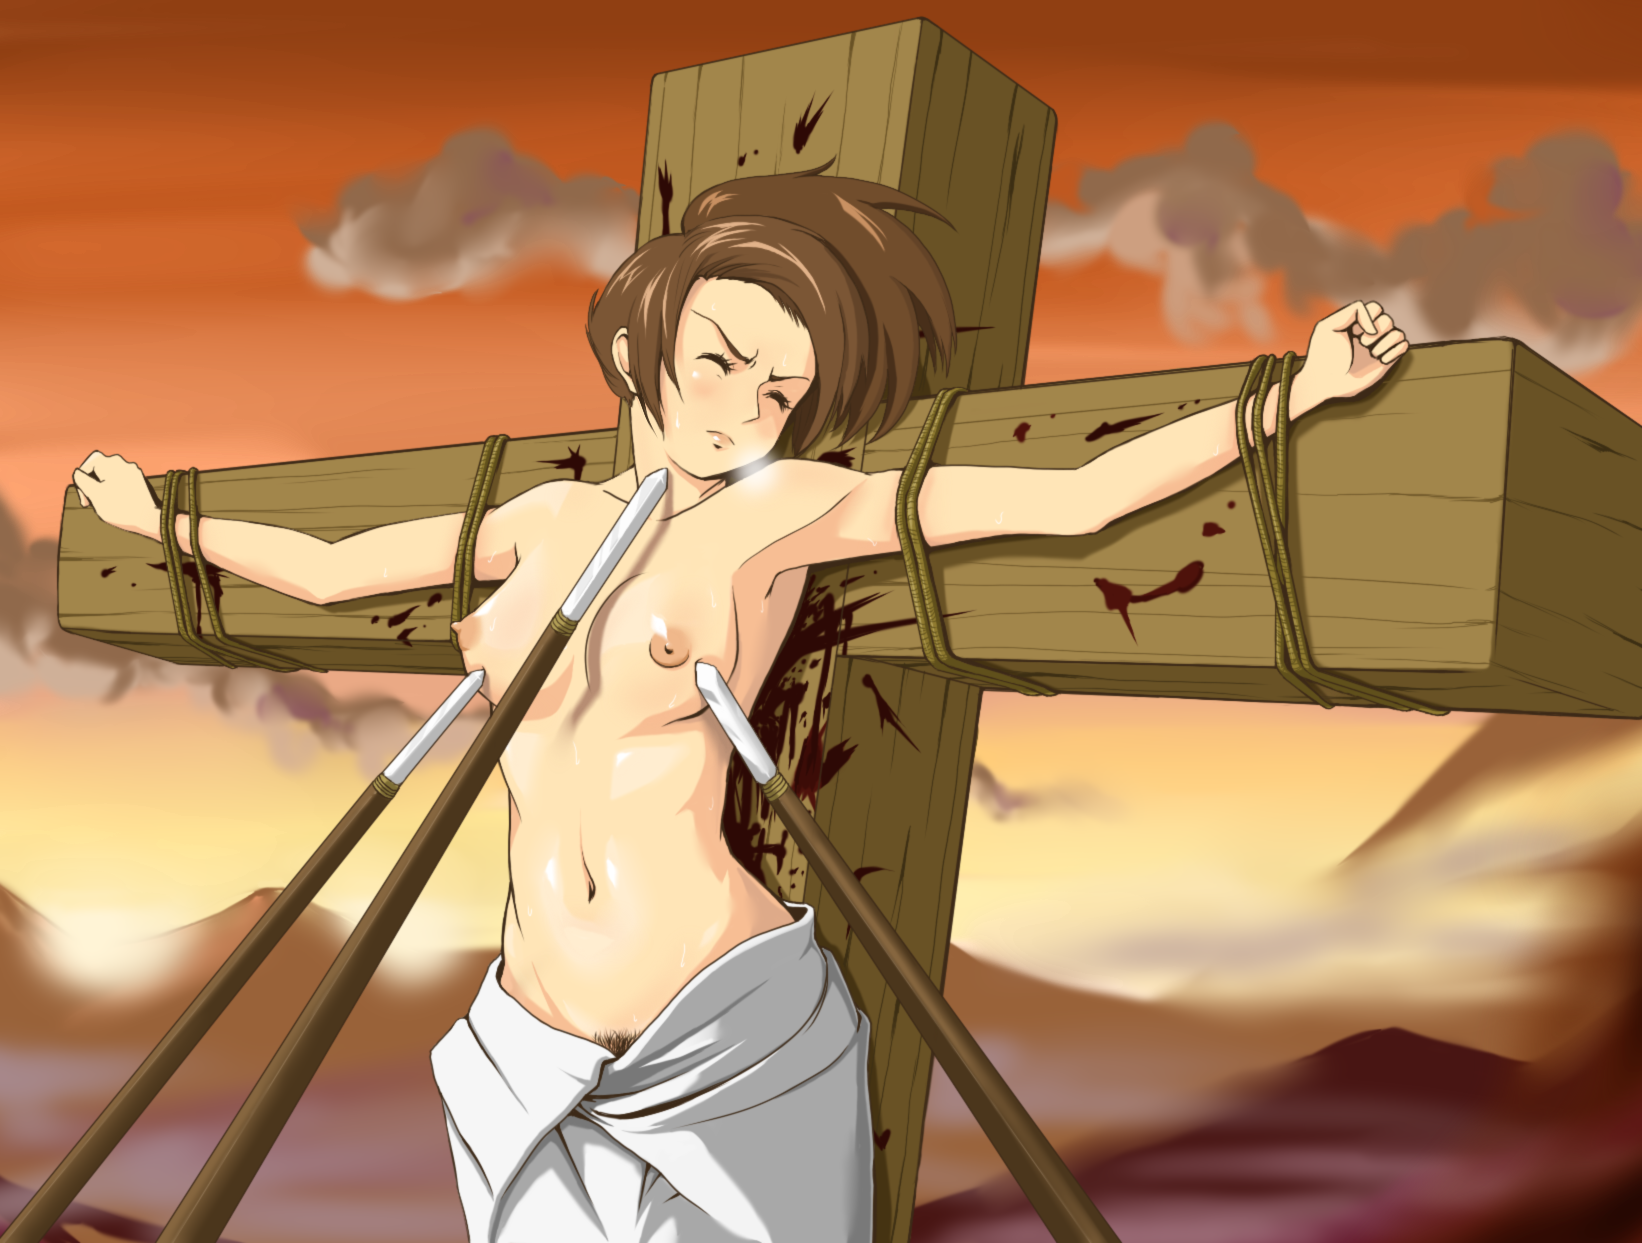 Free download of sex scene from samurai  cartoon picture